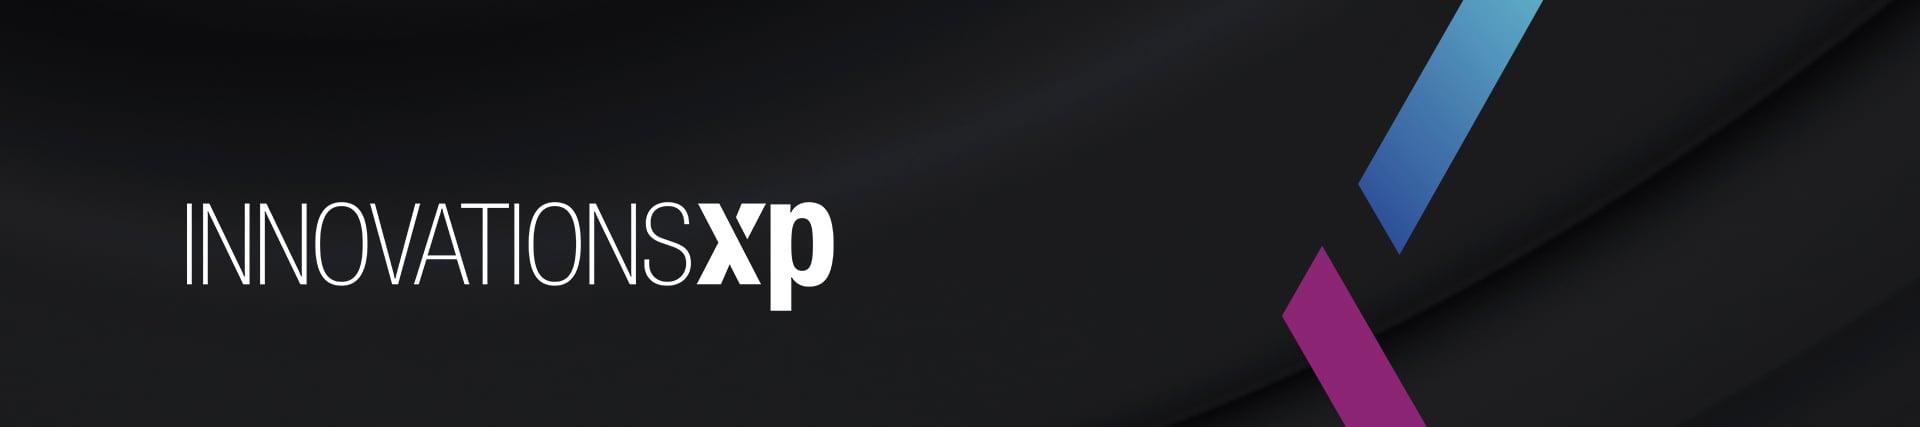 InnovationsXP